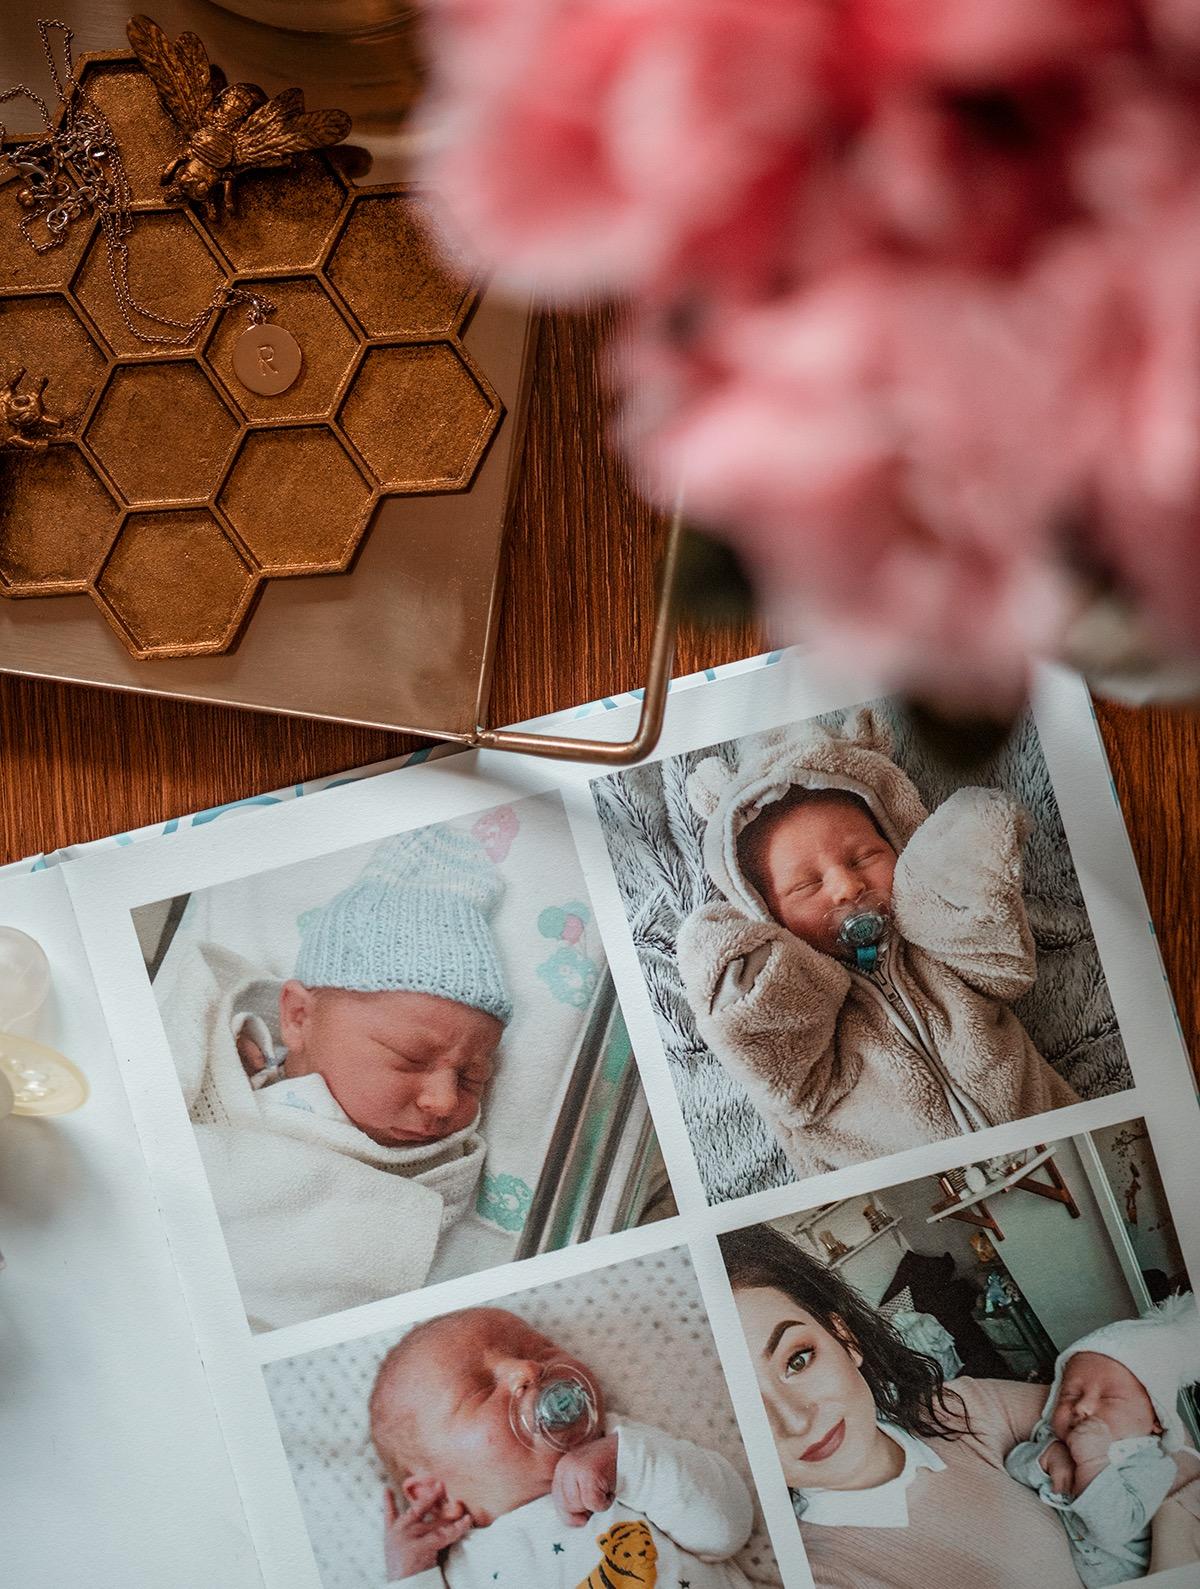 Traumatic births, postpartum depression, postpartum body confidence